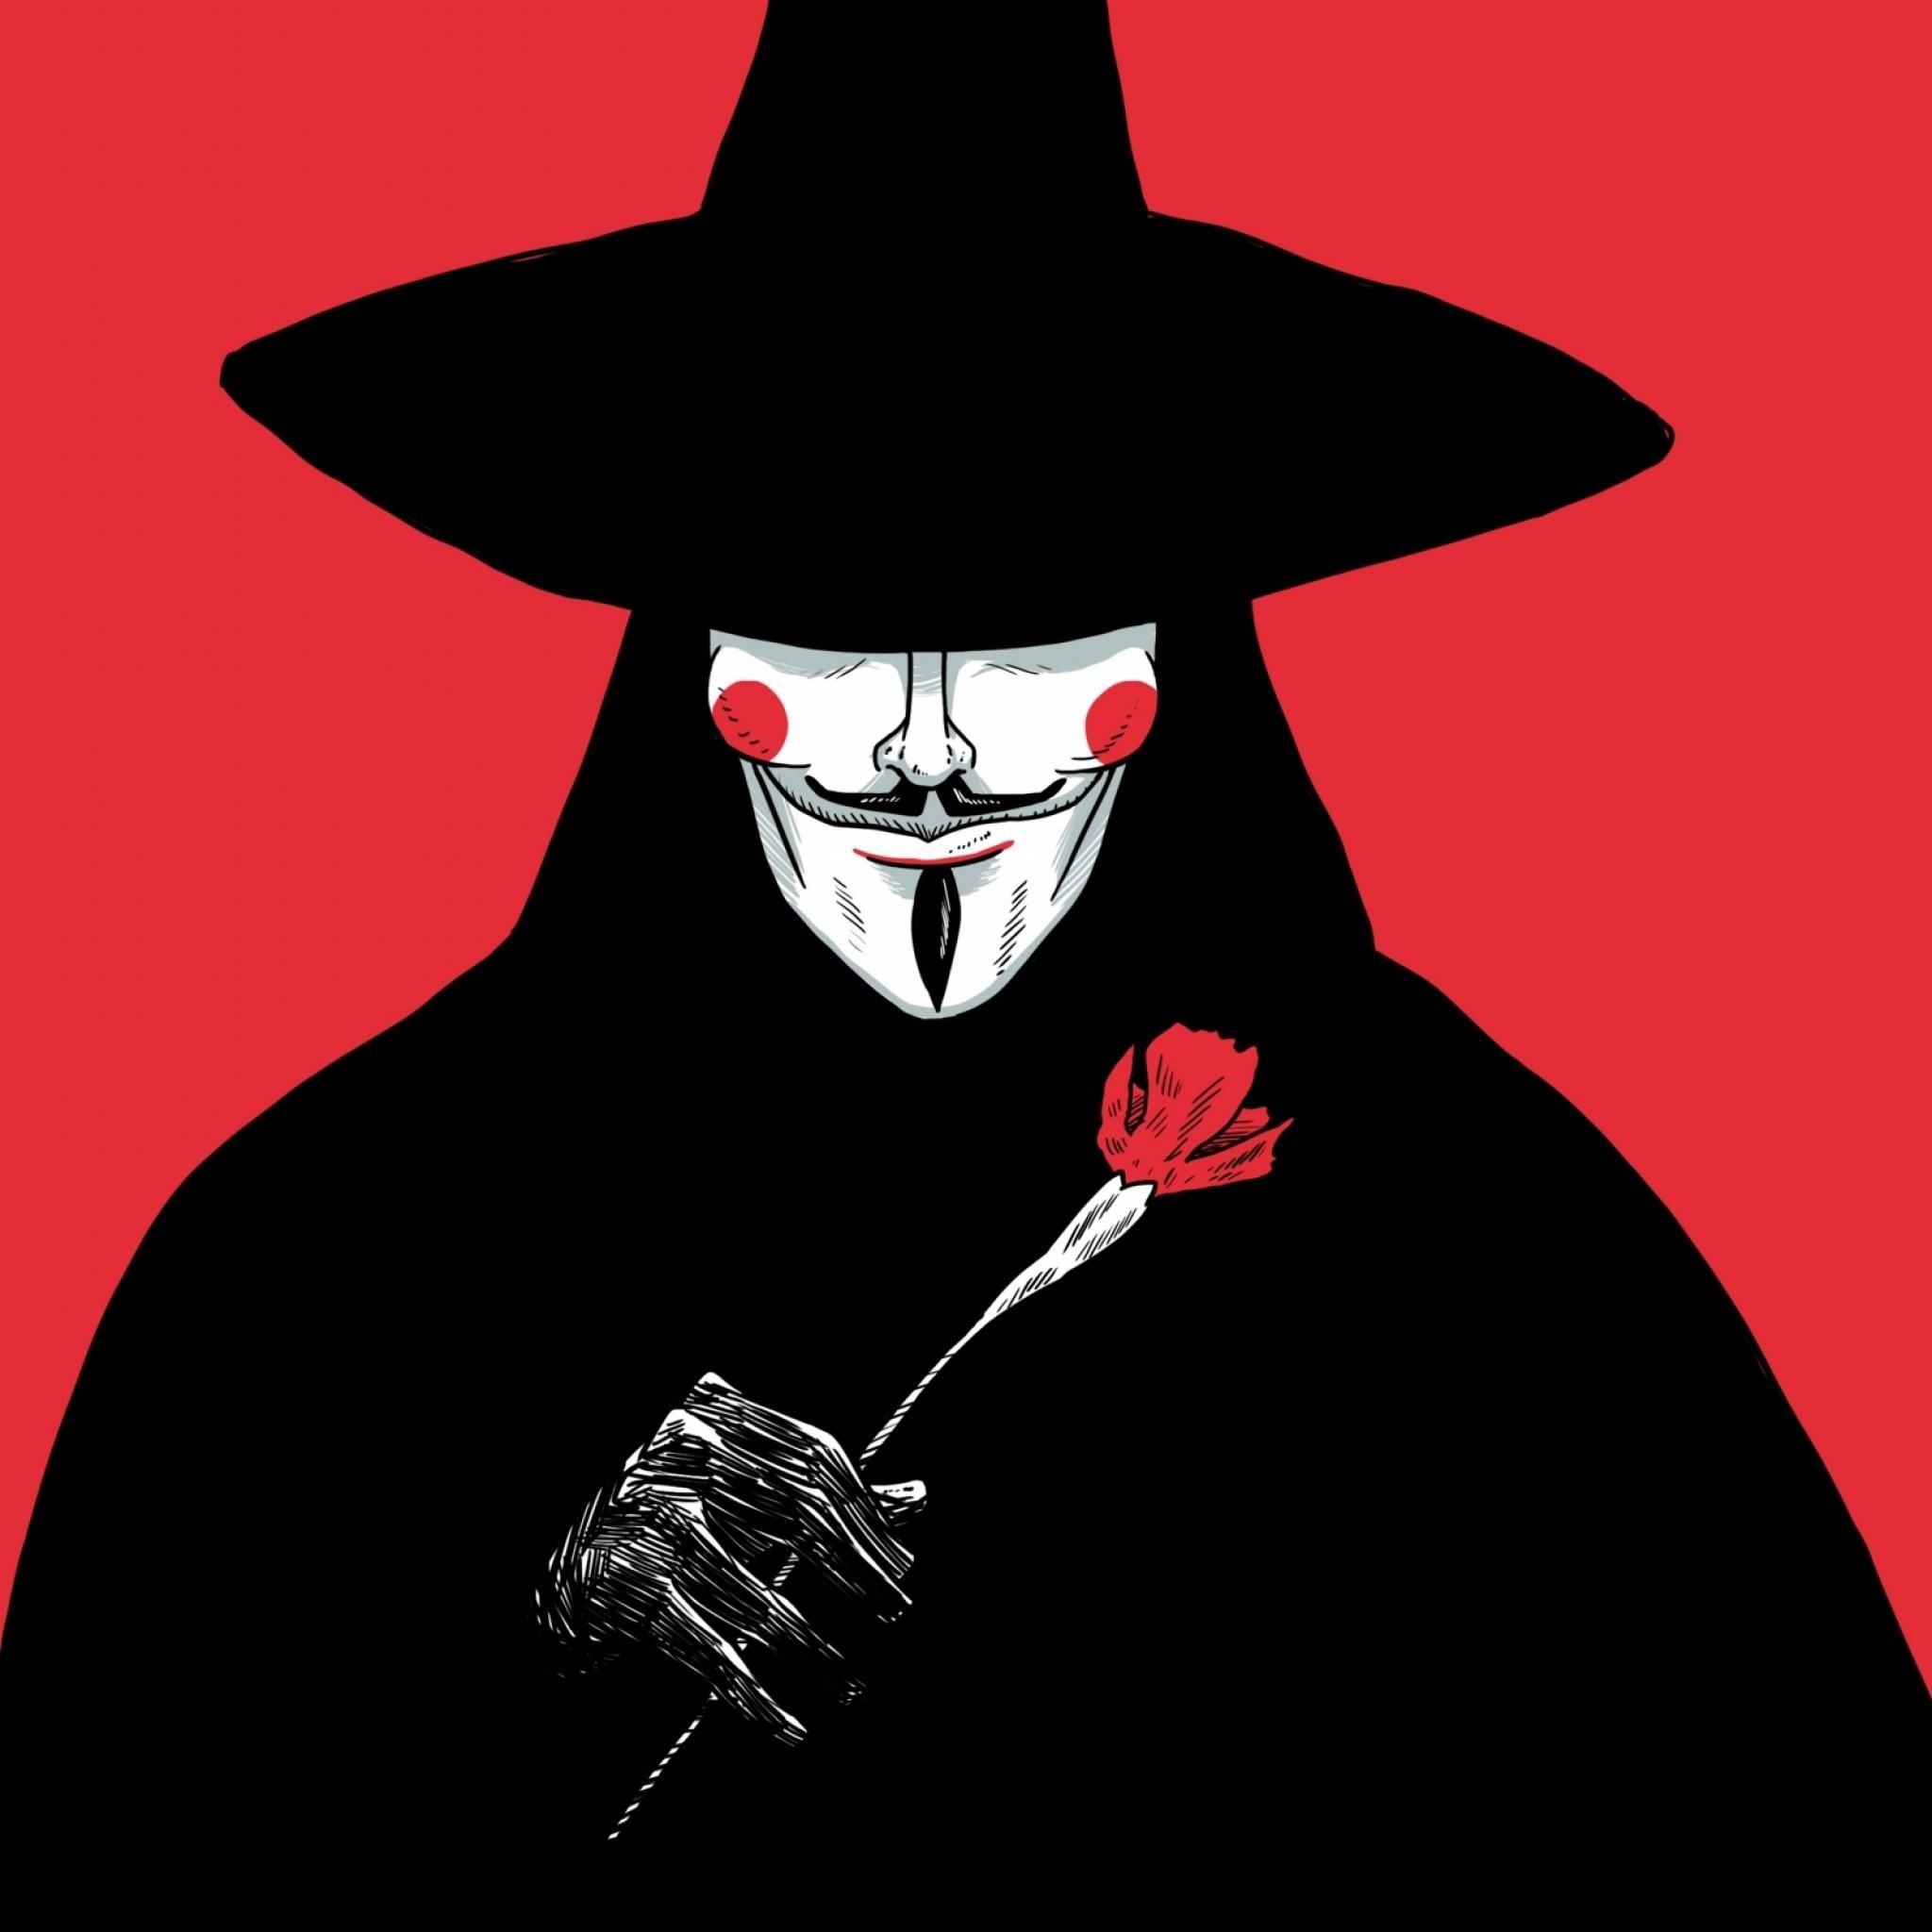 V For Vendetta IPad Wallpaper HD